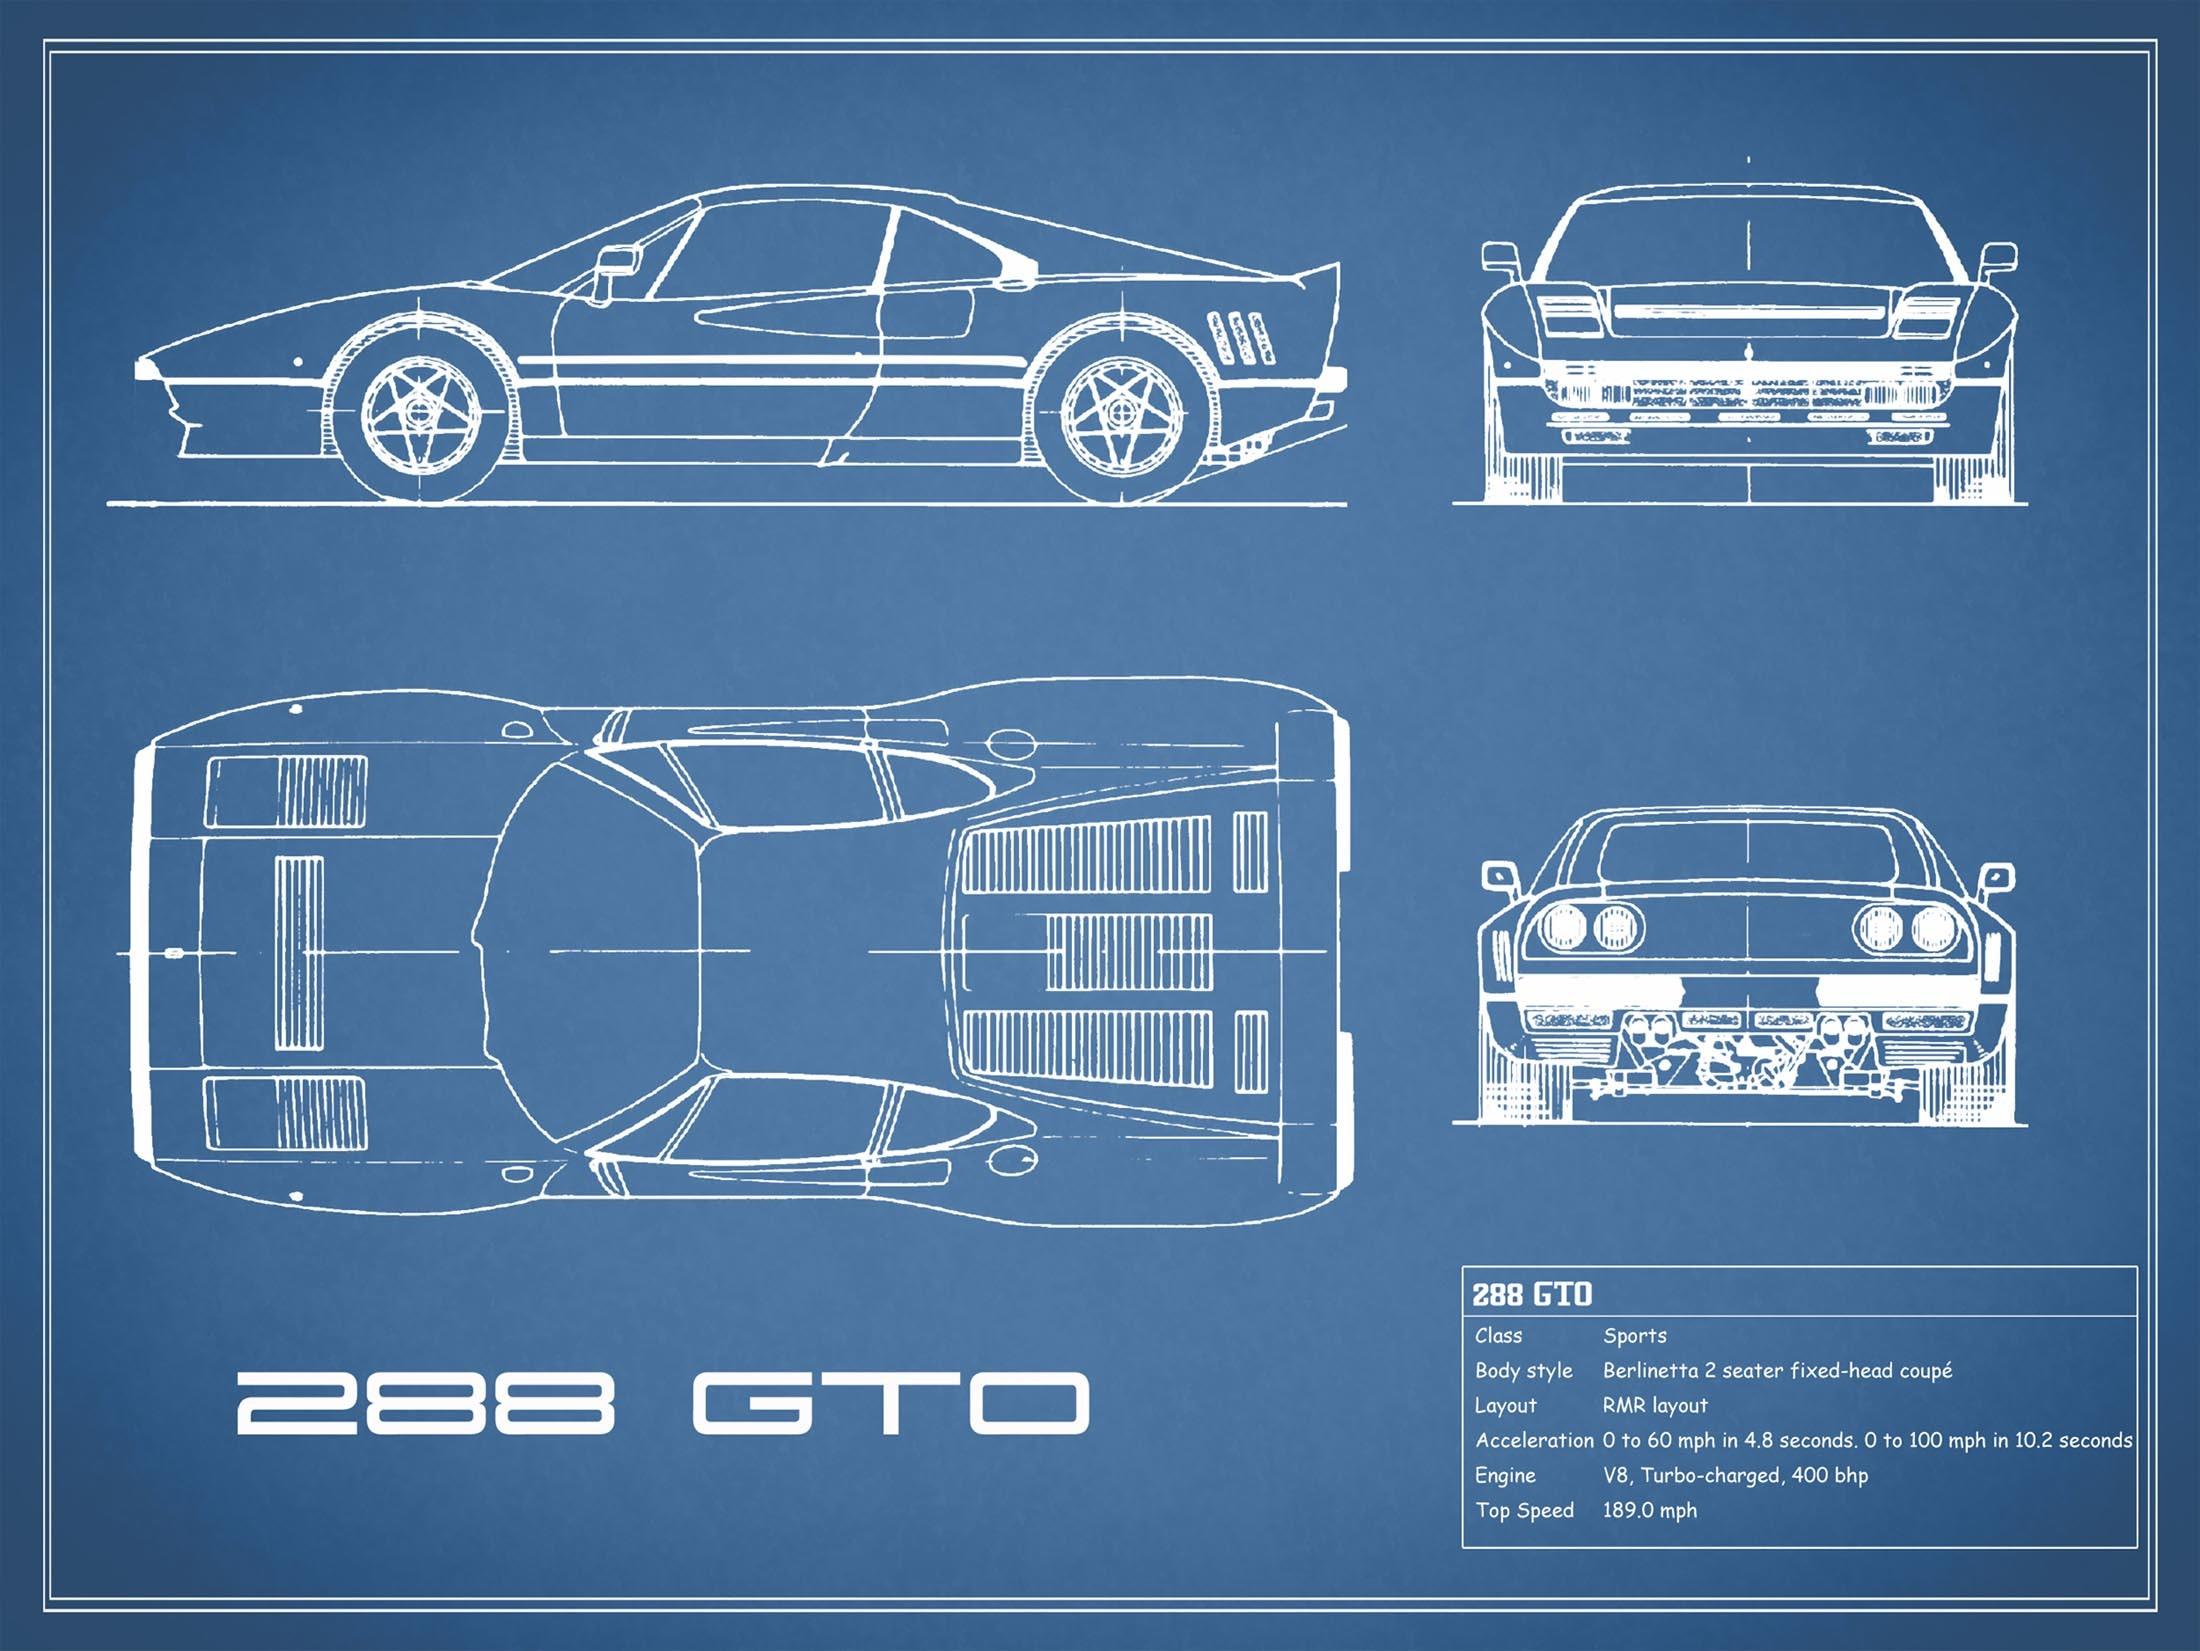 Ferrari 288 GTO - Blue